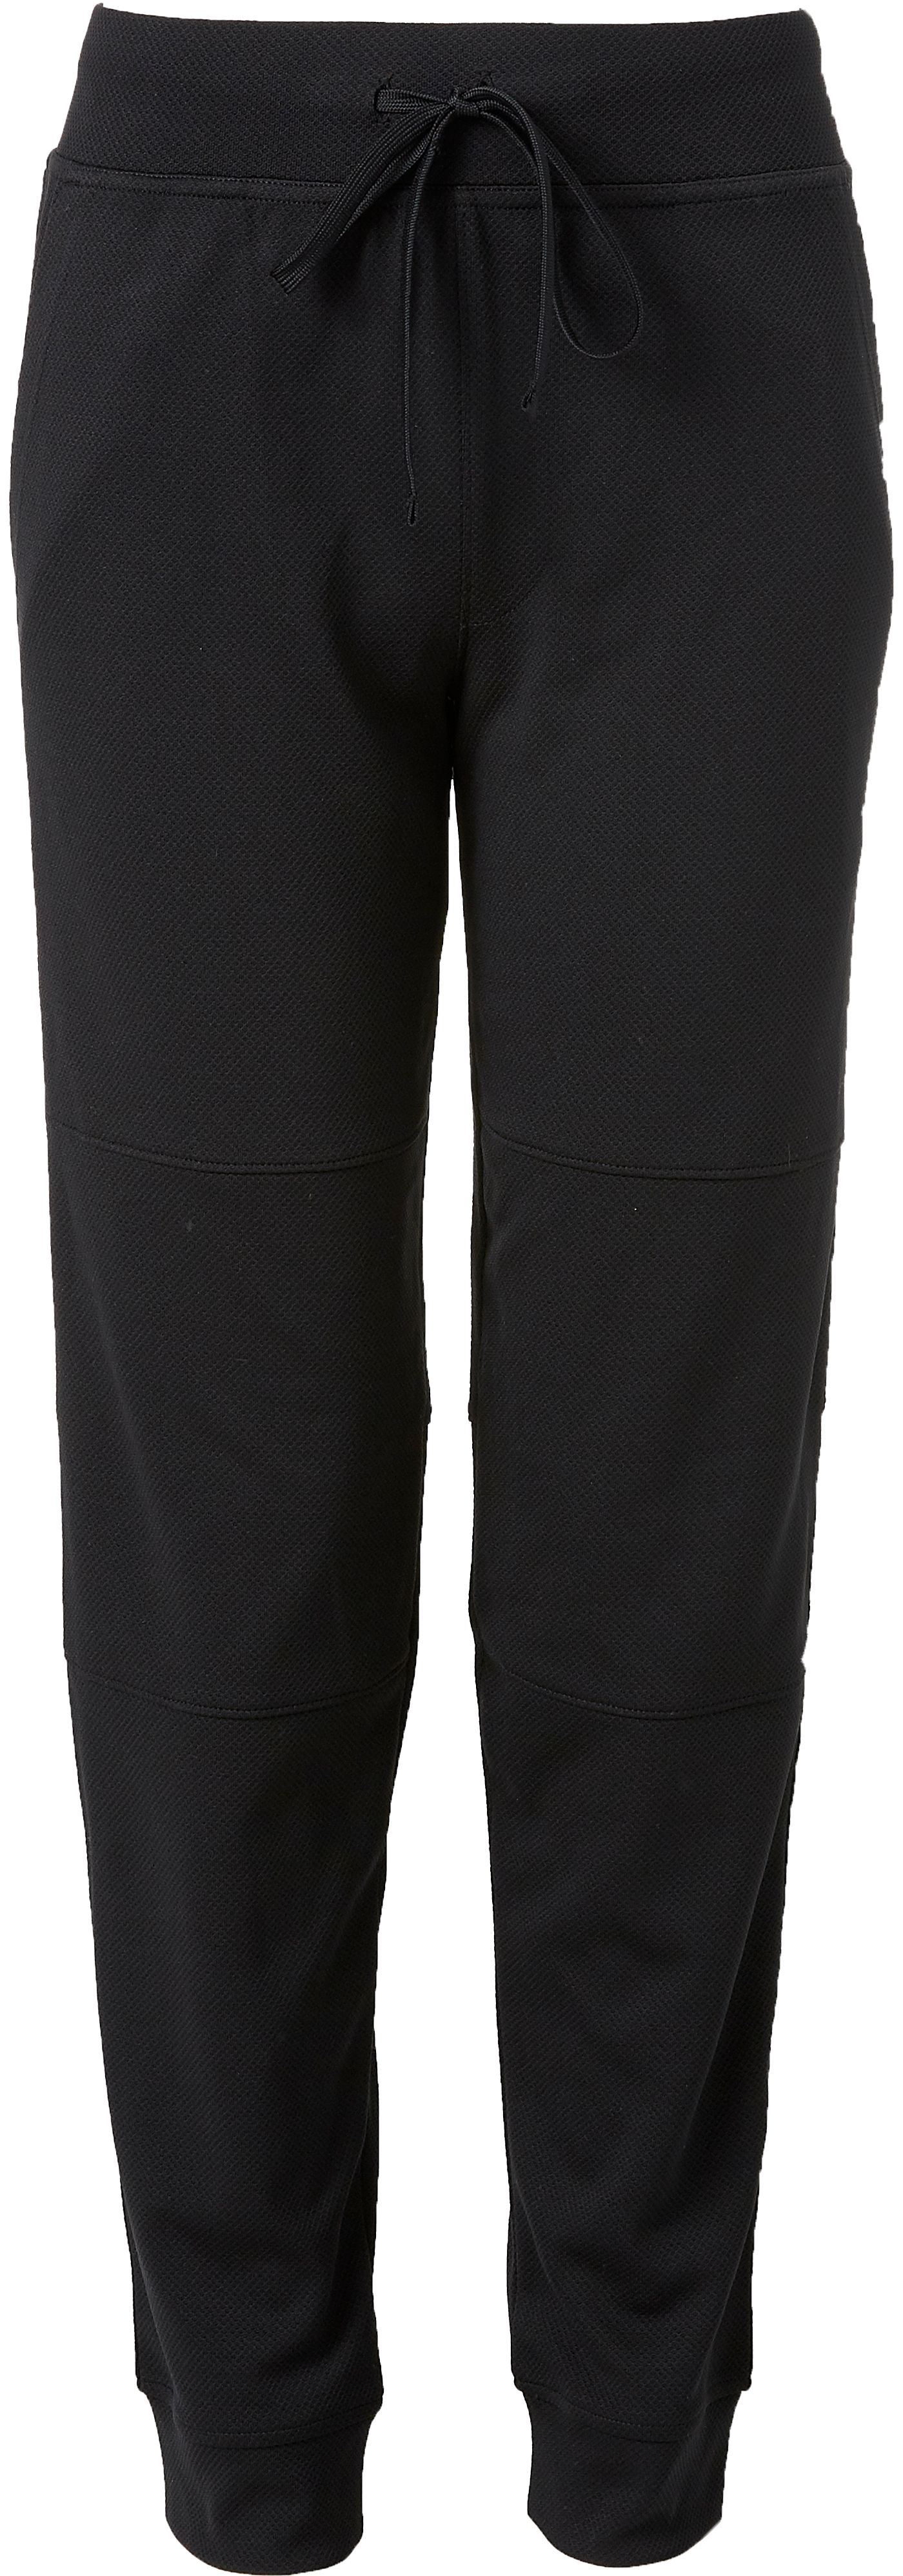 Reebok Boys' Mesh Jogger Pants